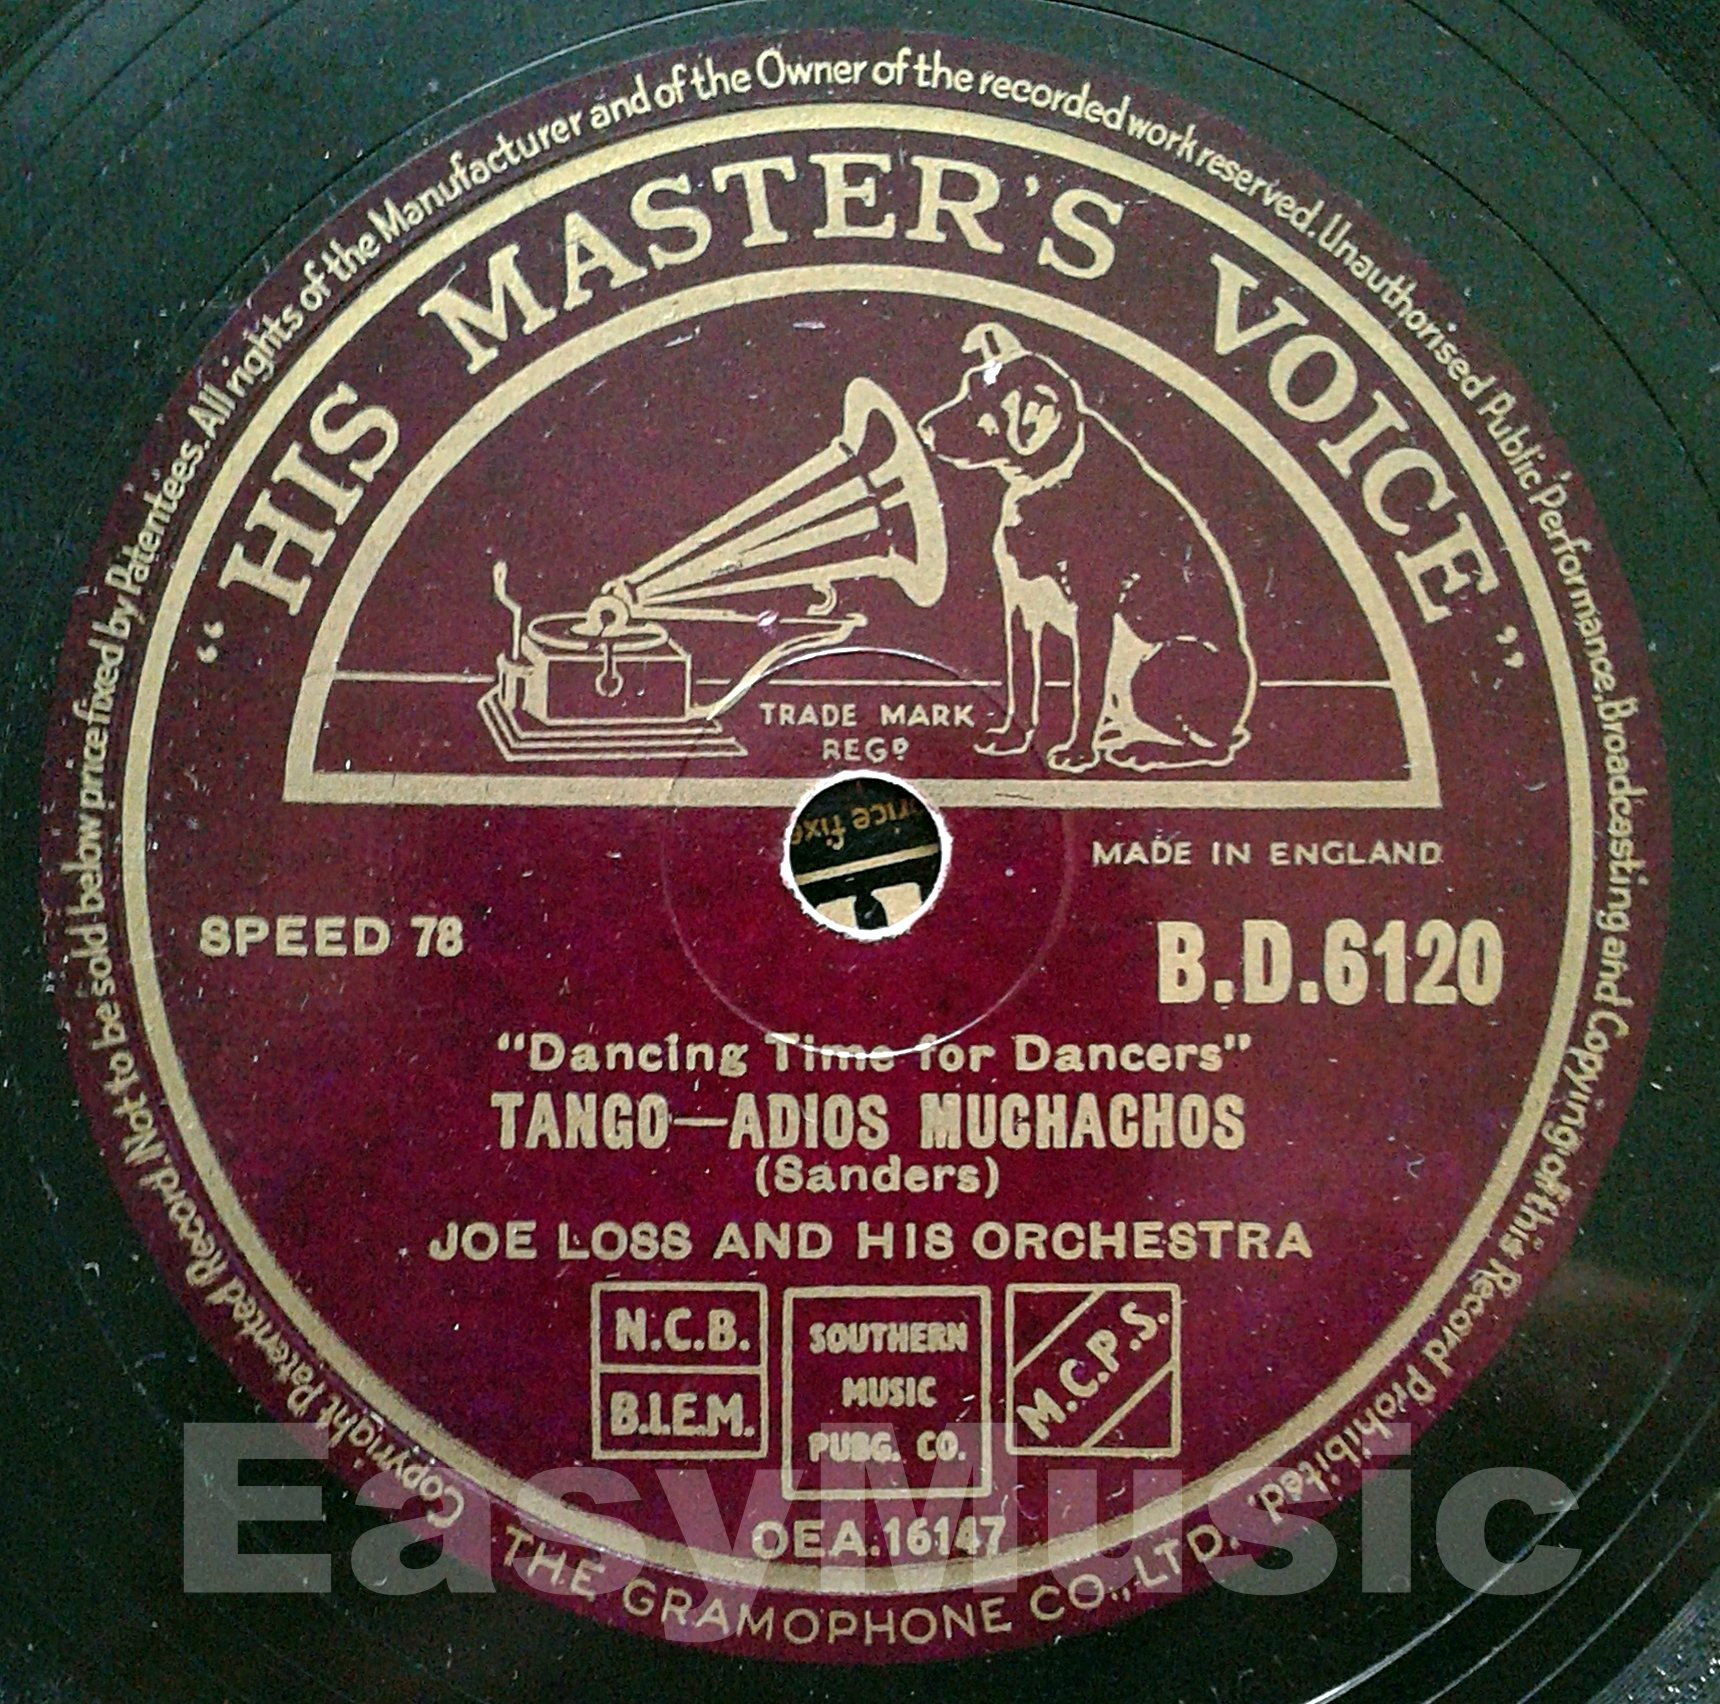 Saturday's concert on 78 rpm